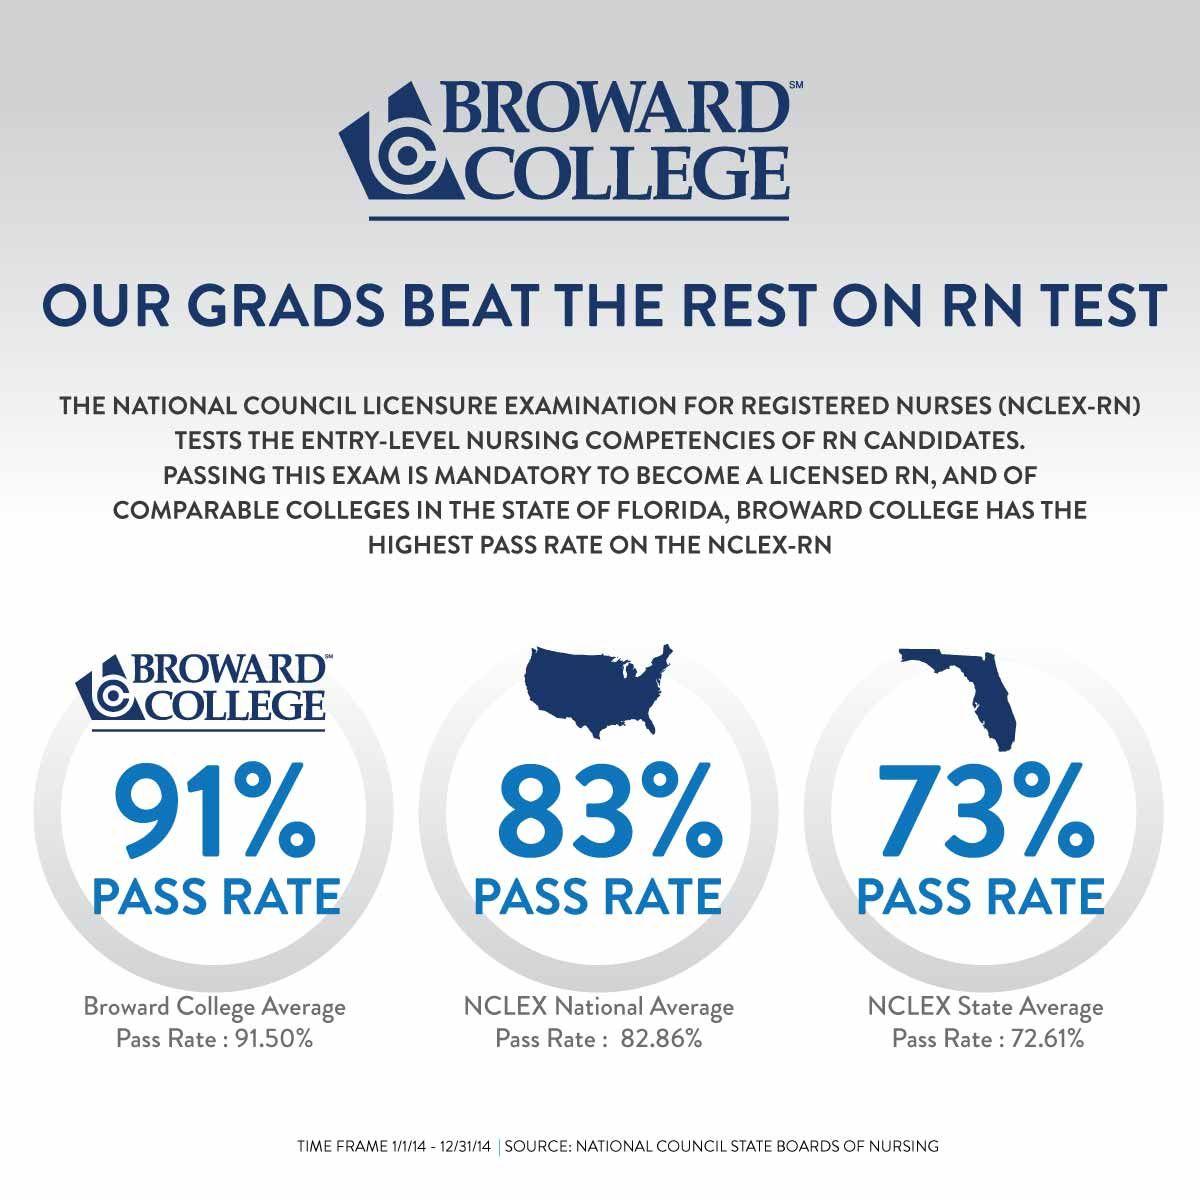 Broward College S Nursing Graduates Earn The Highest Passing Rates On The Rn Exam Nurse Broward College College Nursing